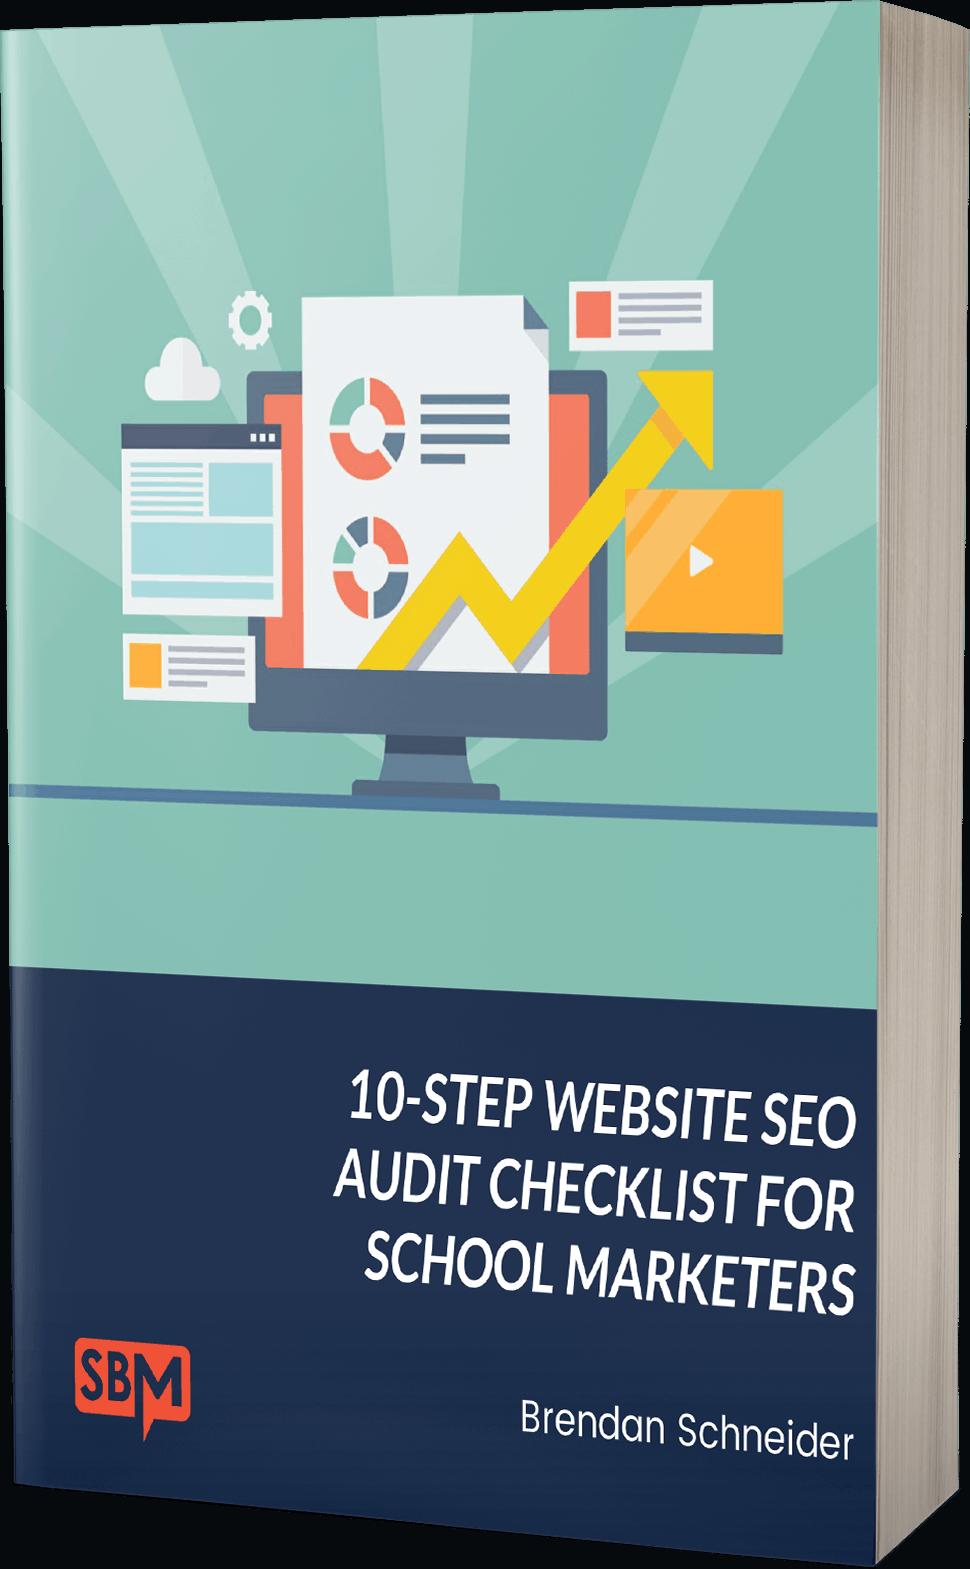 10-Step Website SEO Audit Checklist for School Marketers